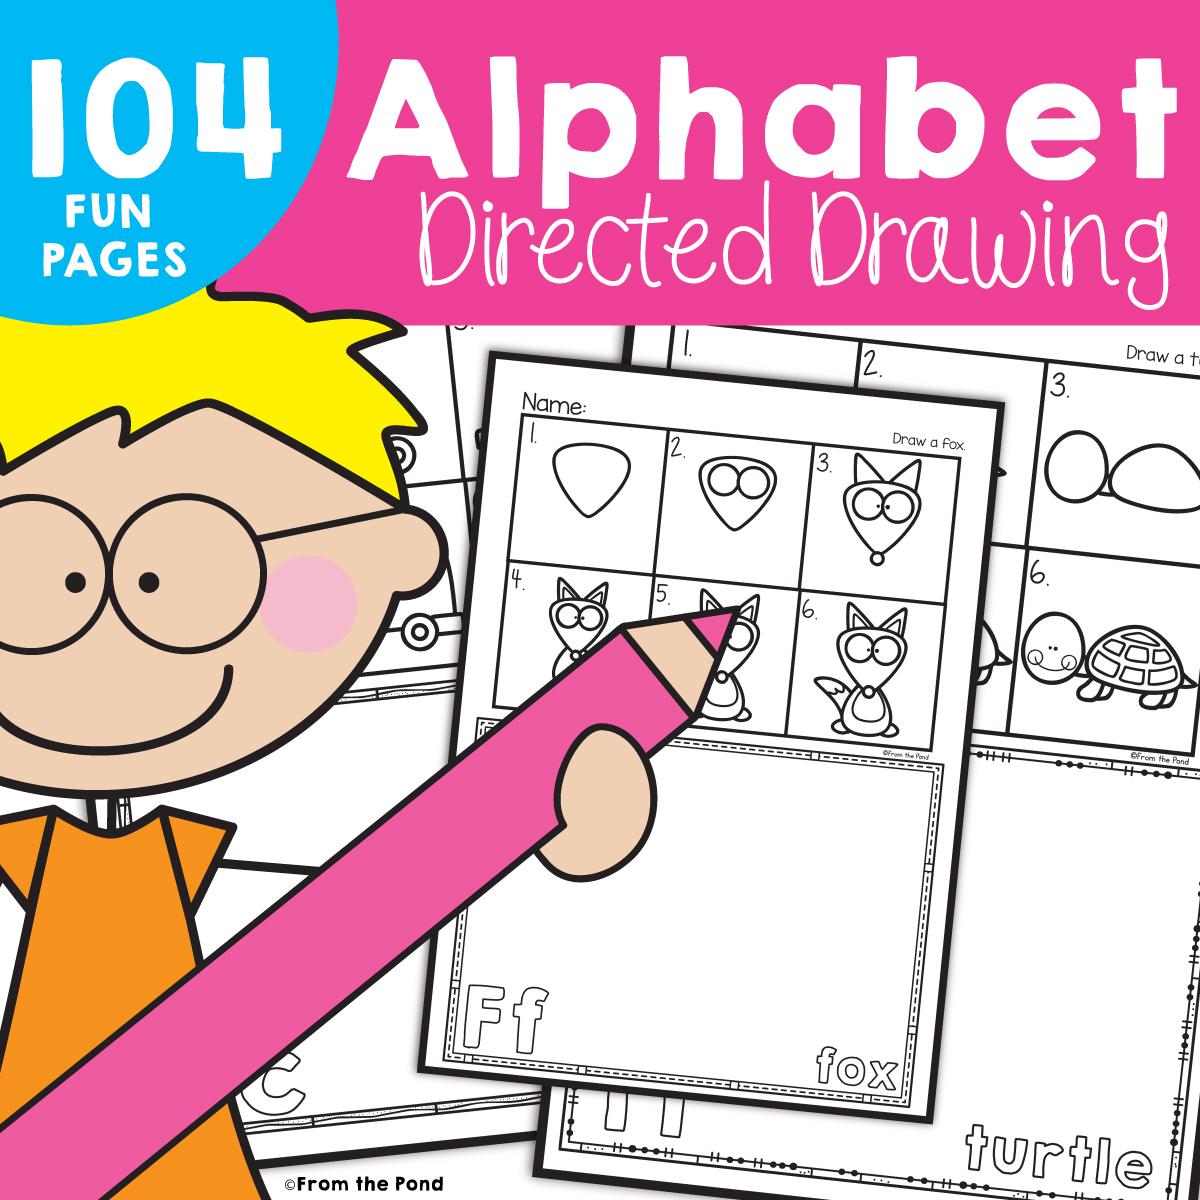 D Dog House Alphabet Directed Draw...